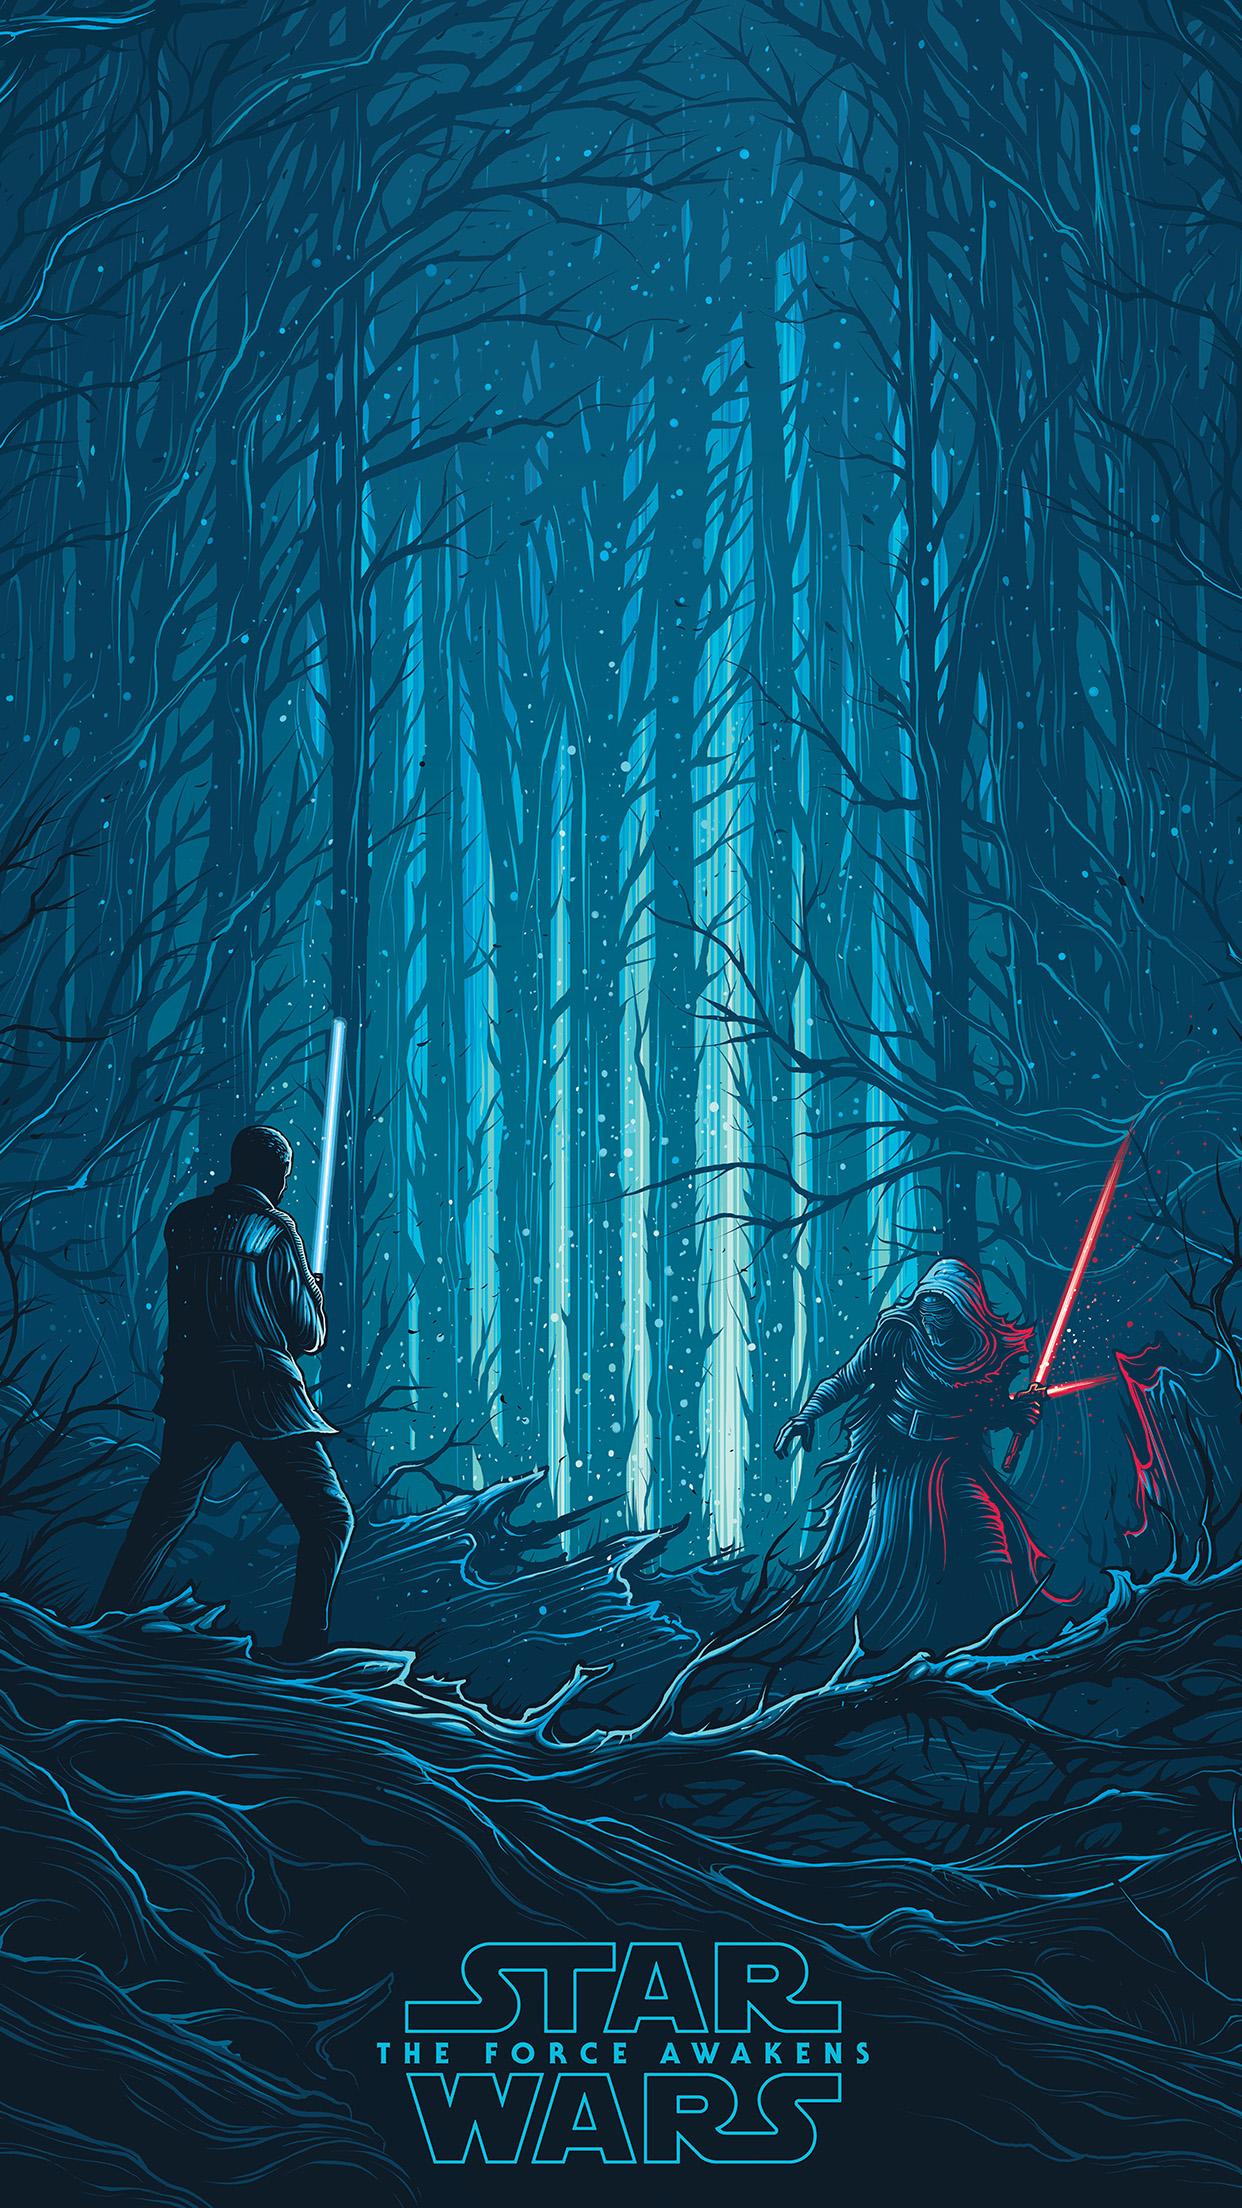 Star Wars 7 Wallpaper Iphone 6